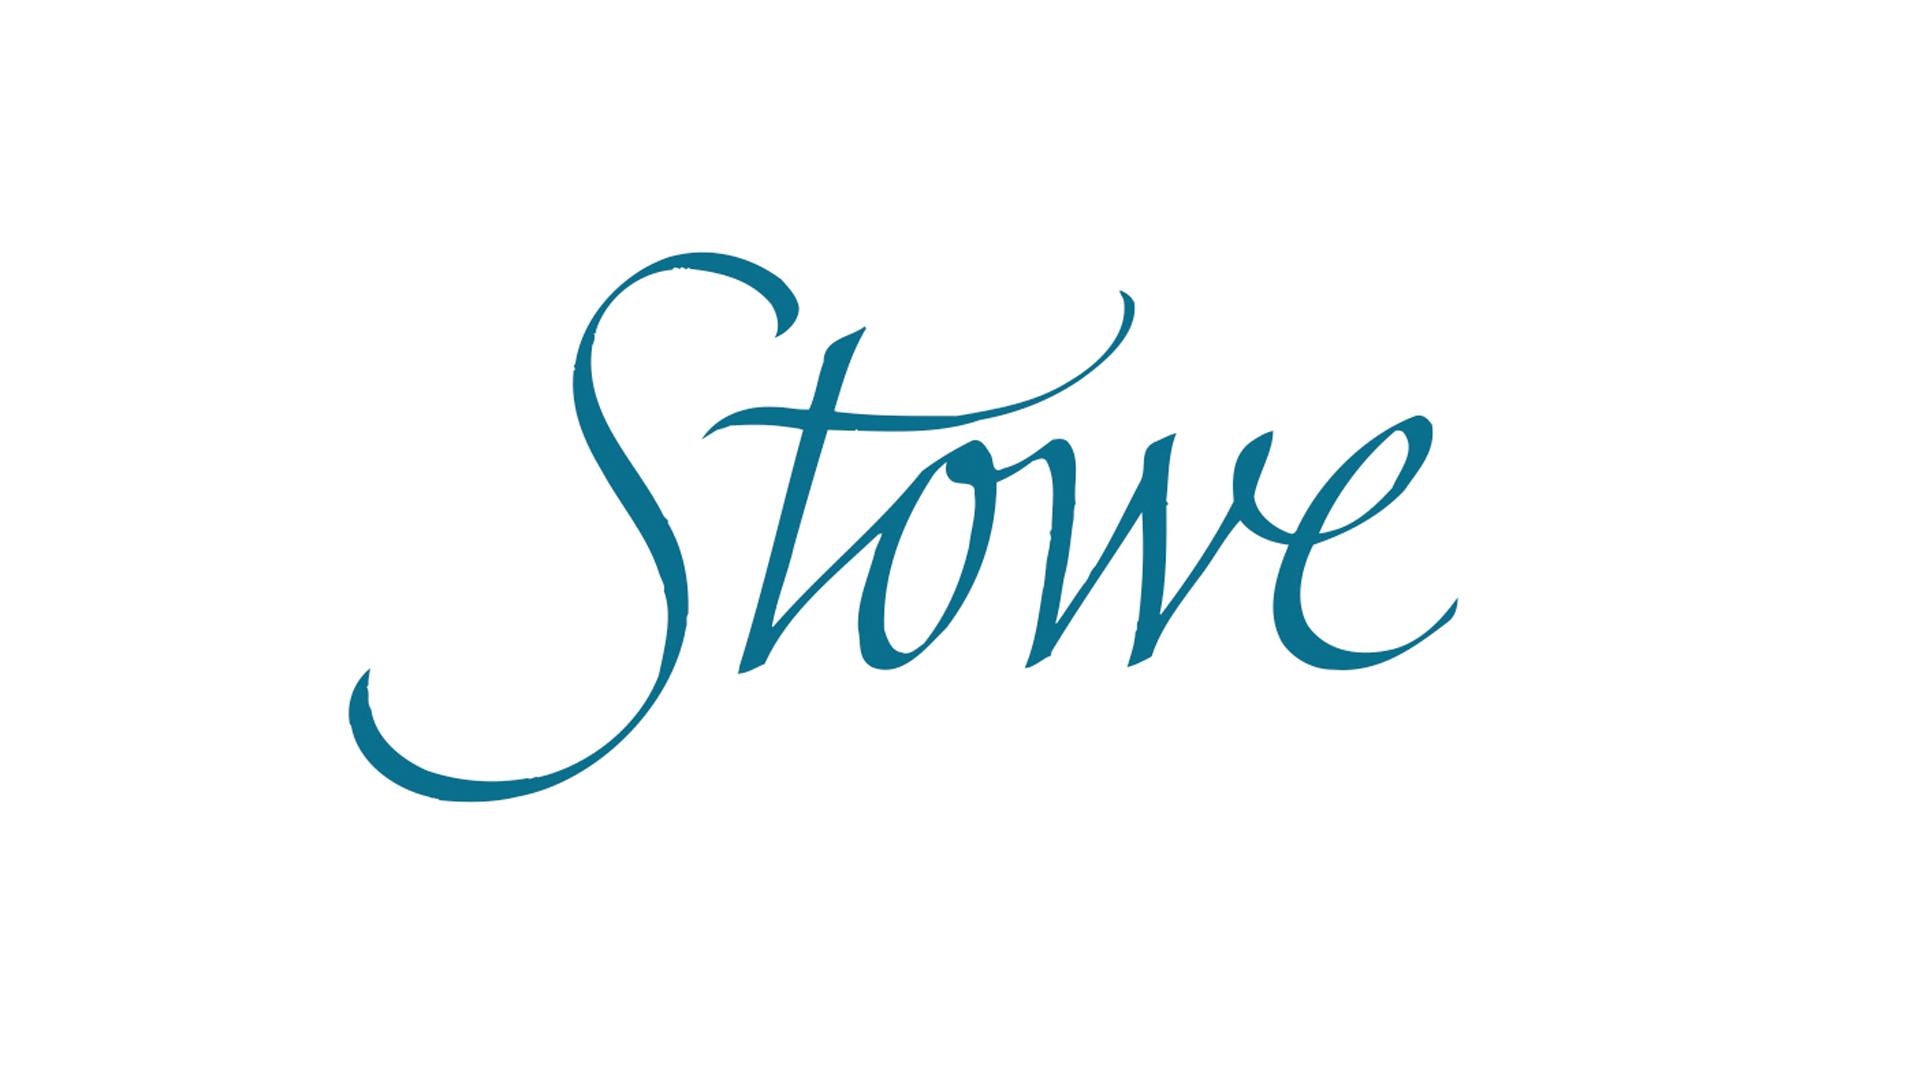 Stowe-hand-written-type-Brand-Identity-Logo